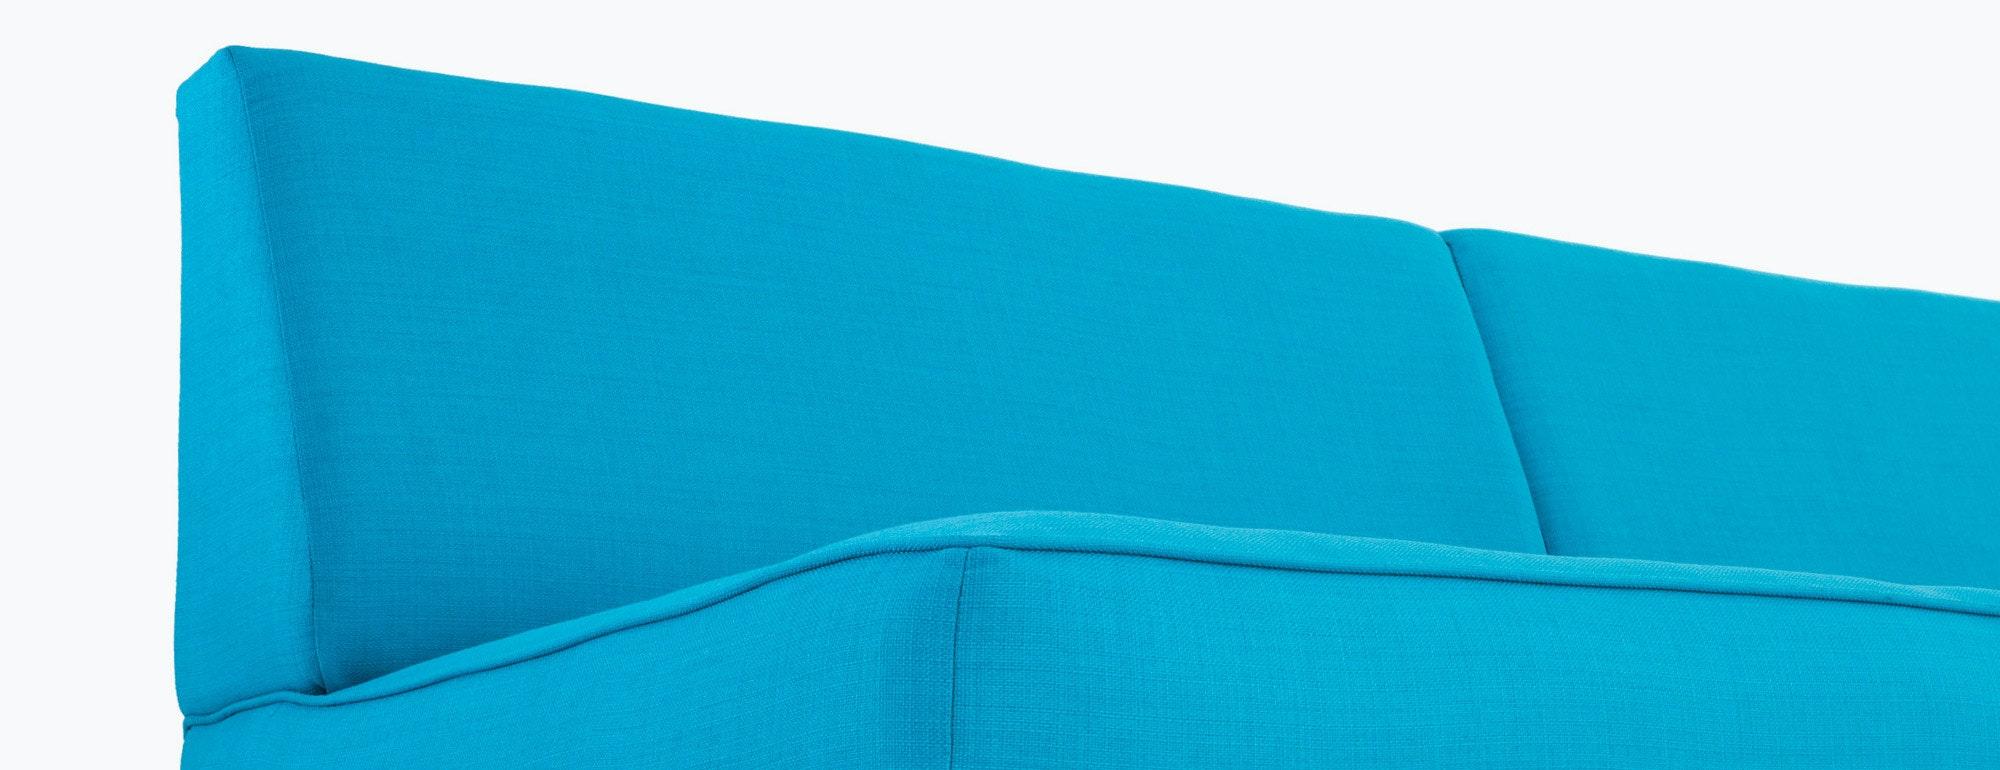 shown in Vibe Aquatic Fabric